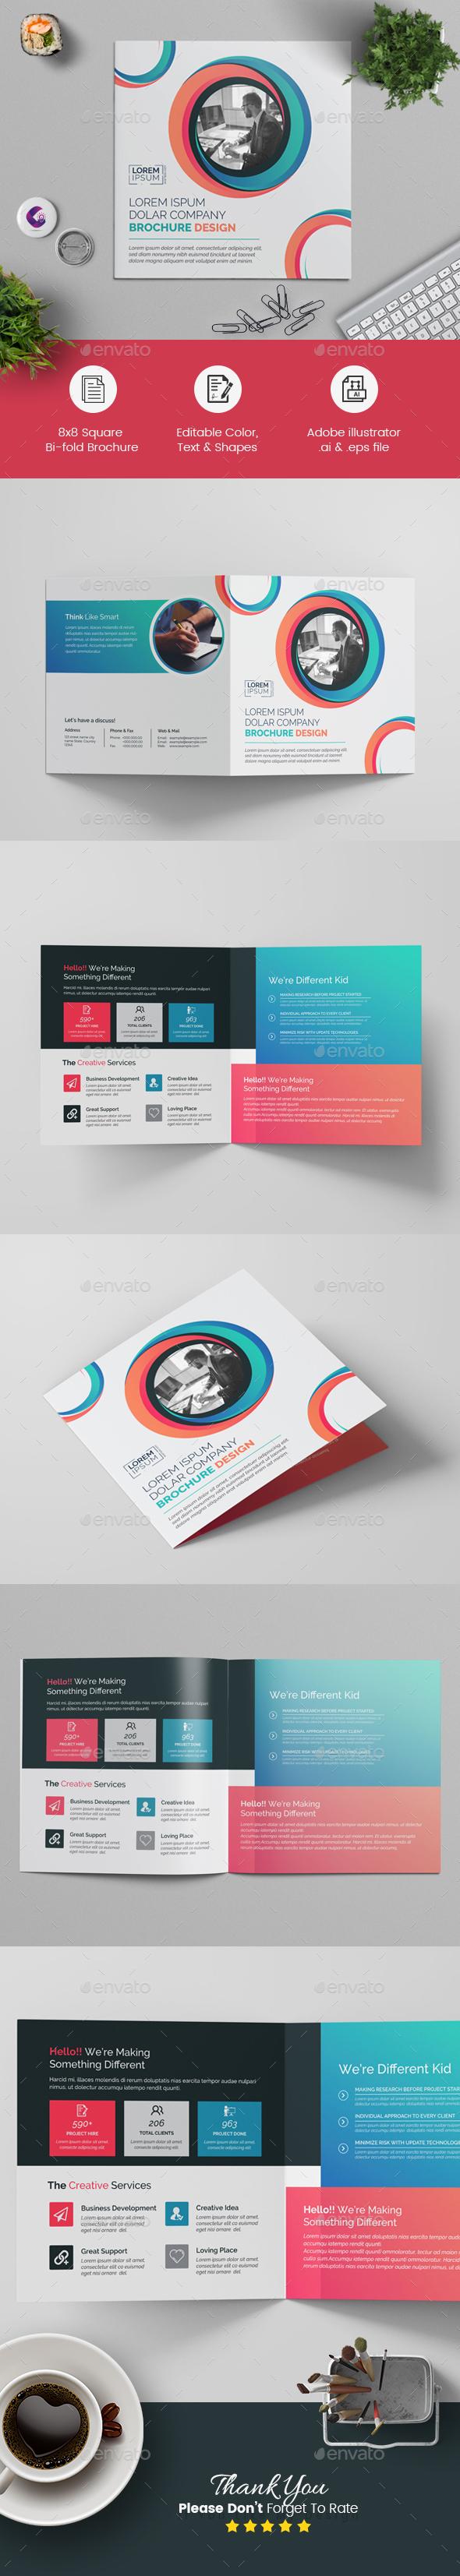 Colorful Square Bi-fold Brochure - Corporate Brochures